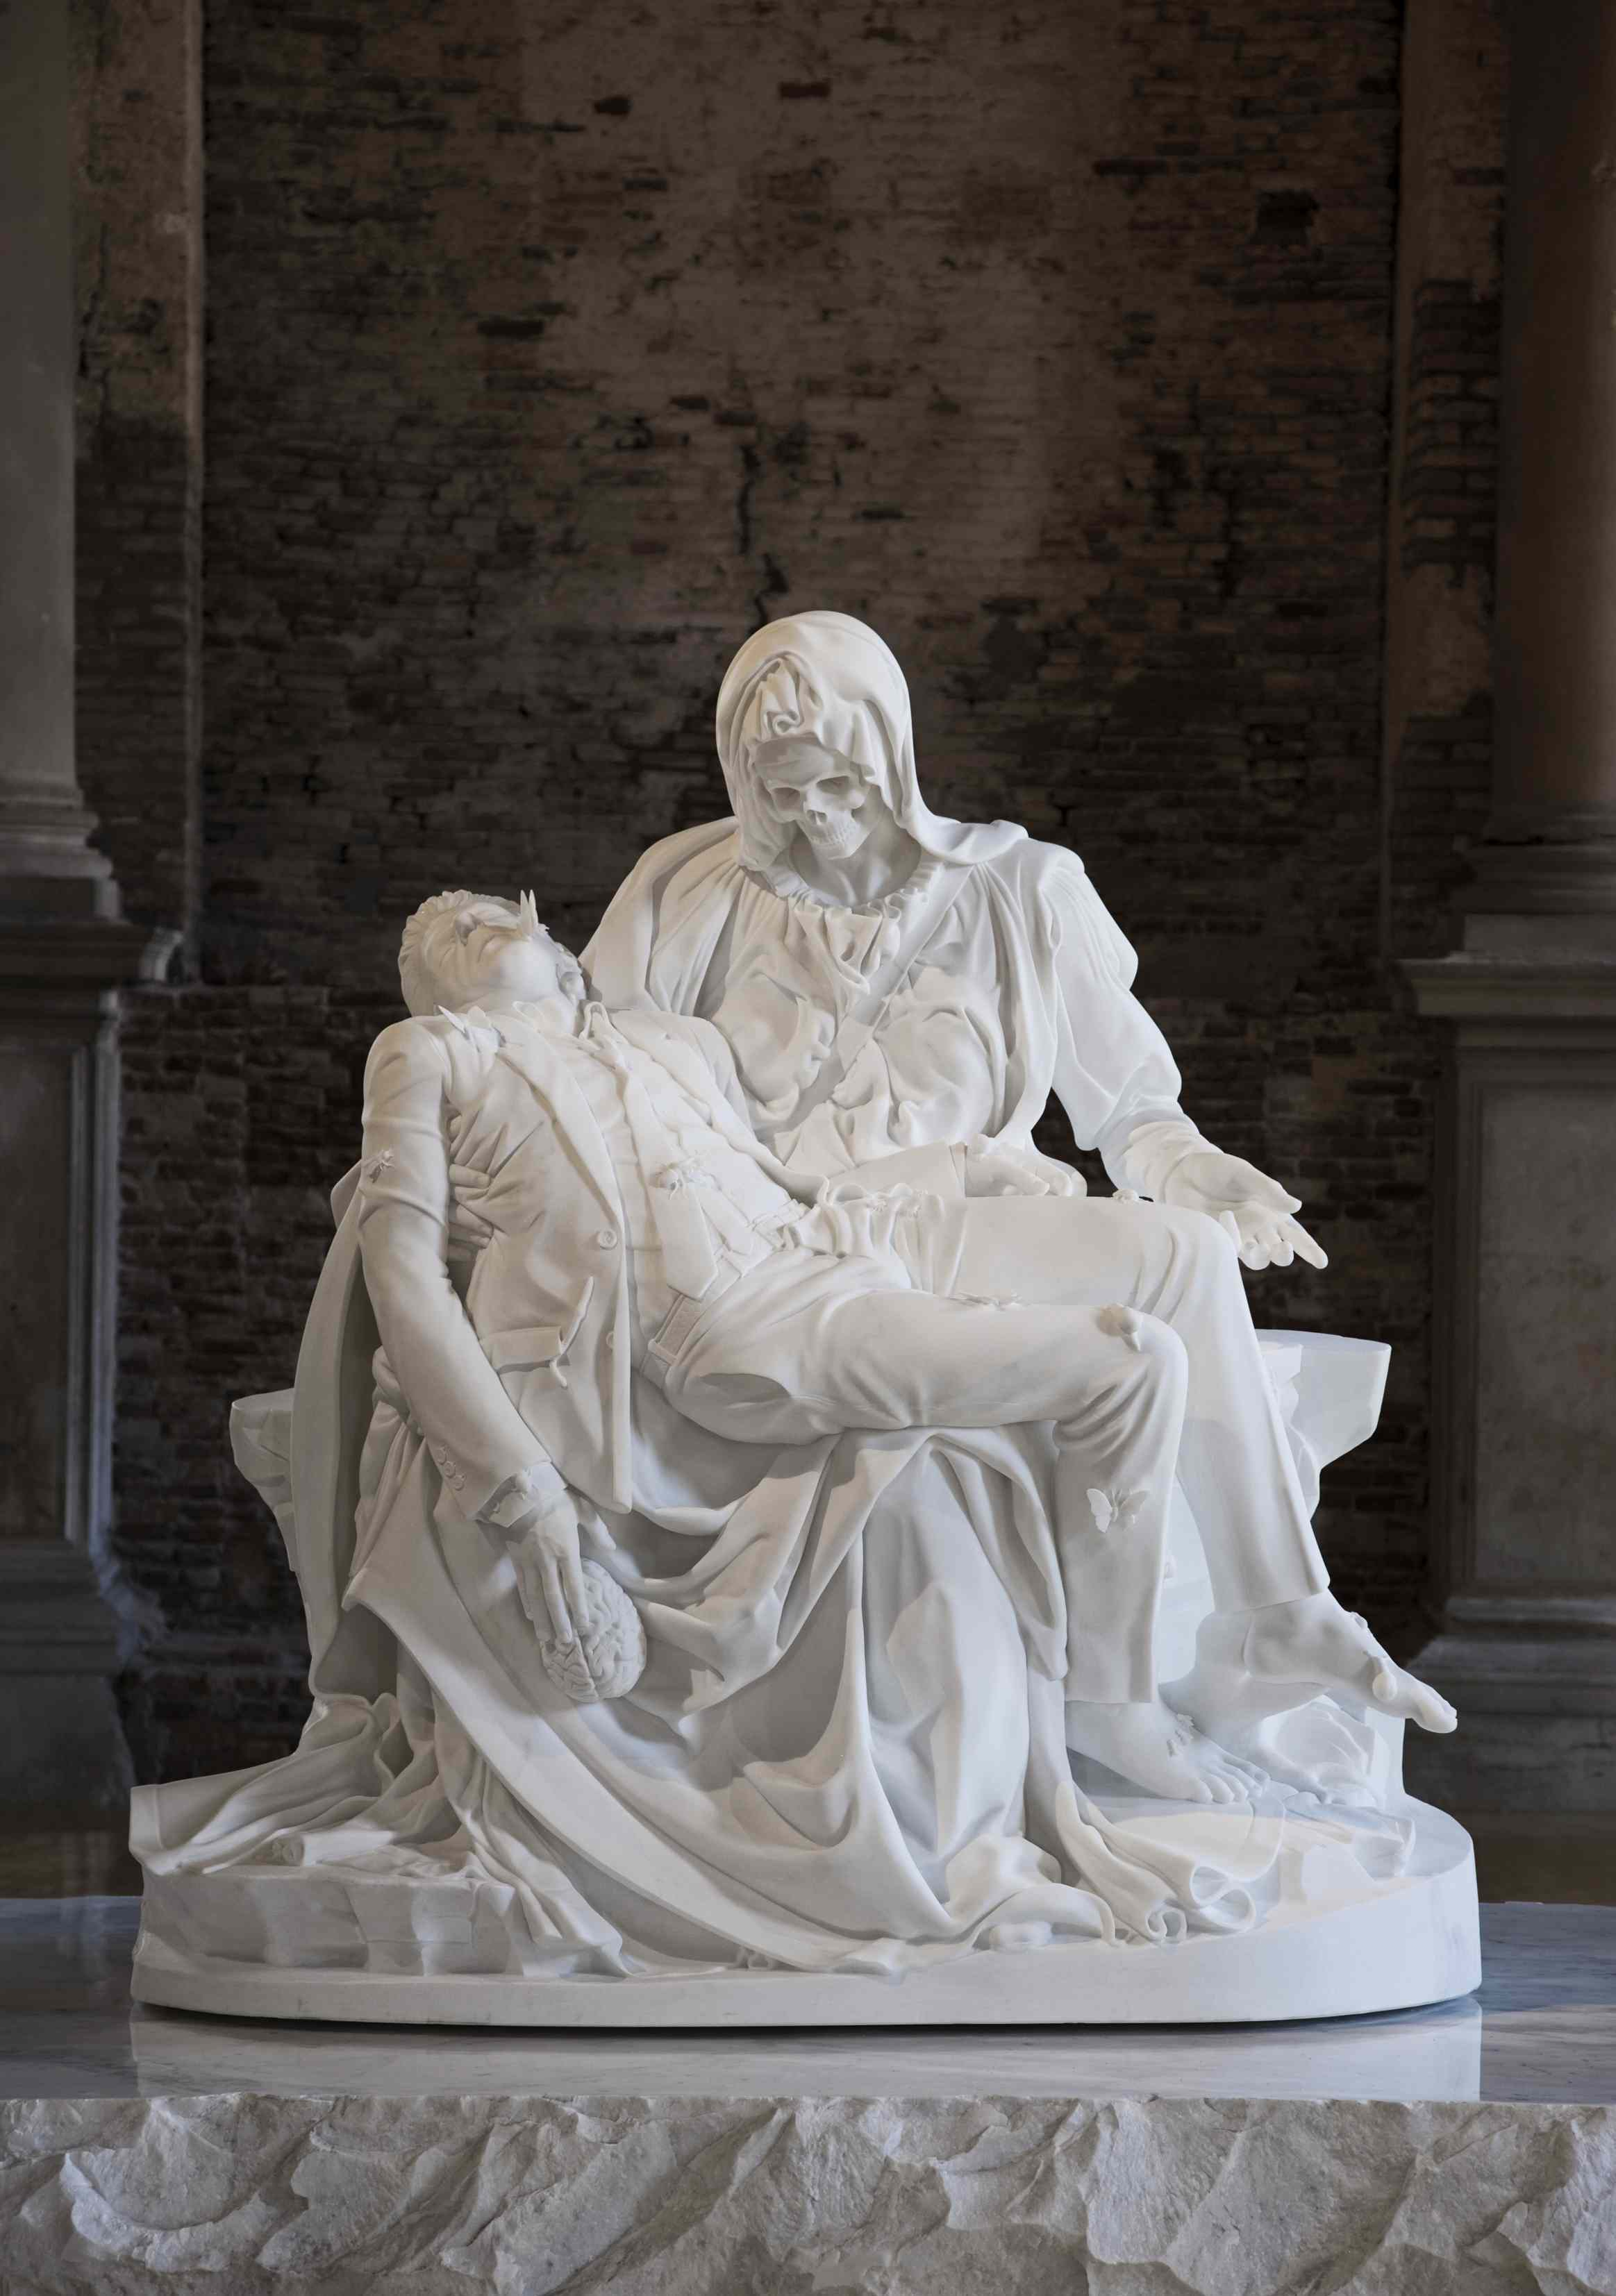 Jan Fabre, Merciful dream (Pietà V), 2011